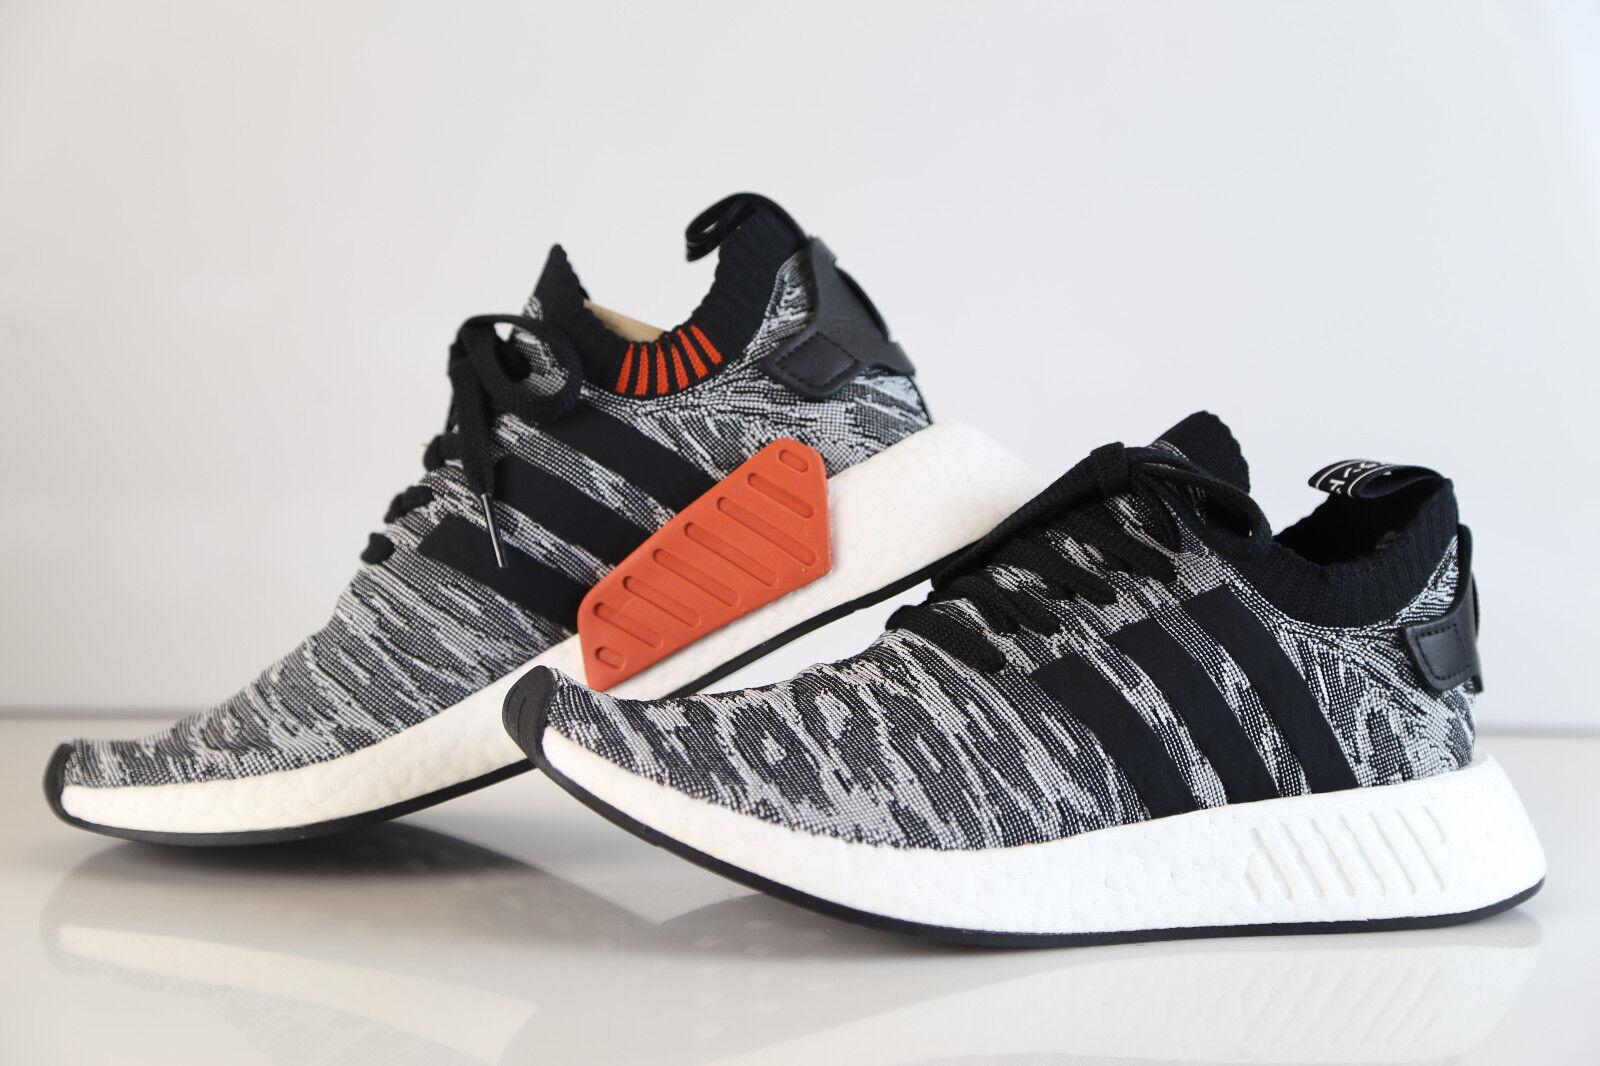 5346f050e2b87 ... reduced adidas nmd r2 pk tiger camo black white glitch by9409 7 13  boost prime knit